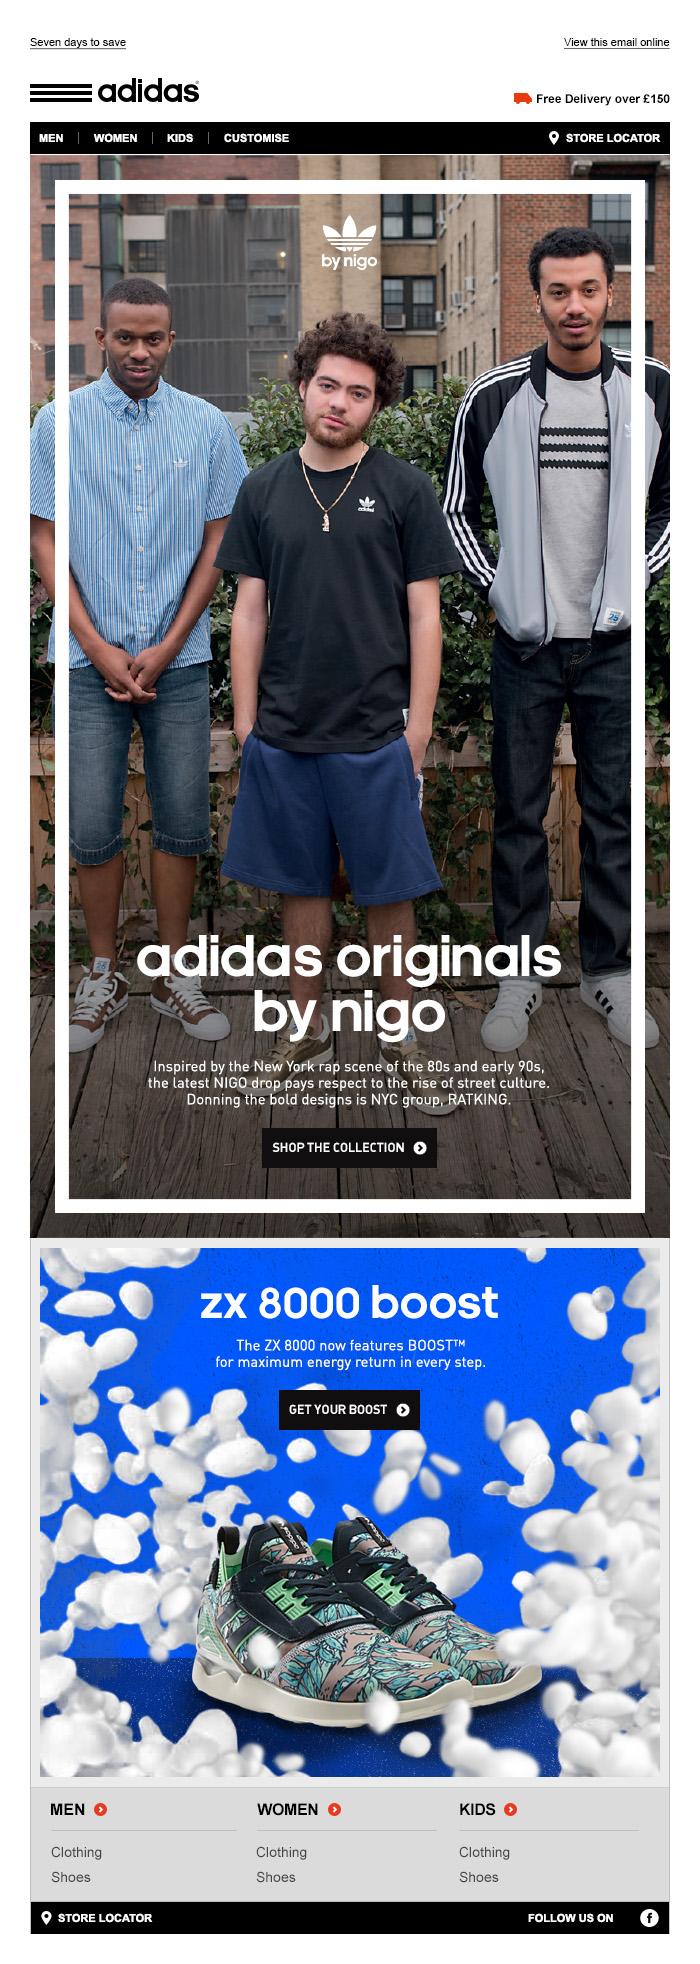 adidas Originals NIGO - Tim Tayyar, freelance copywriter